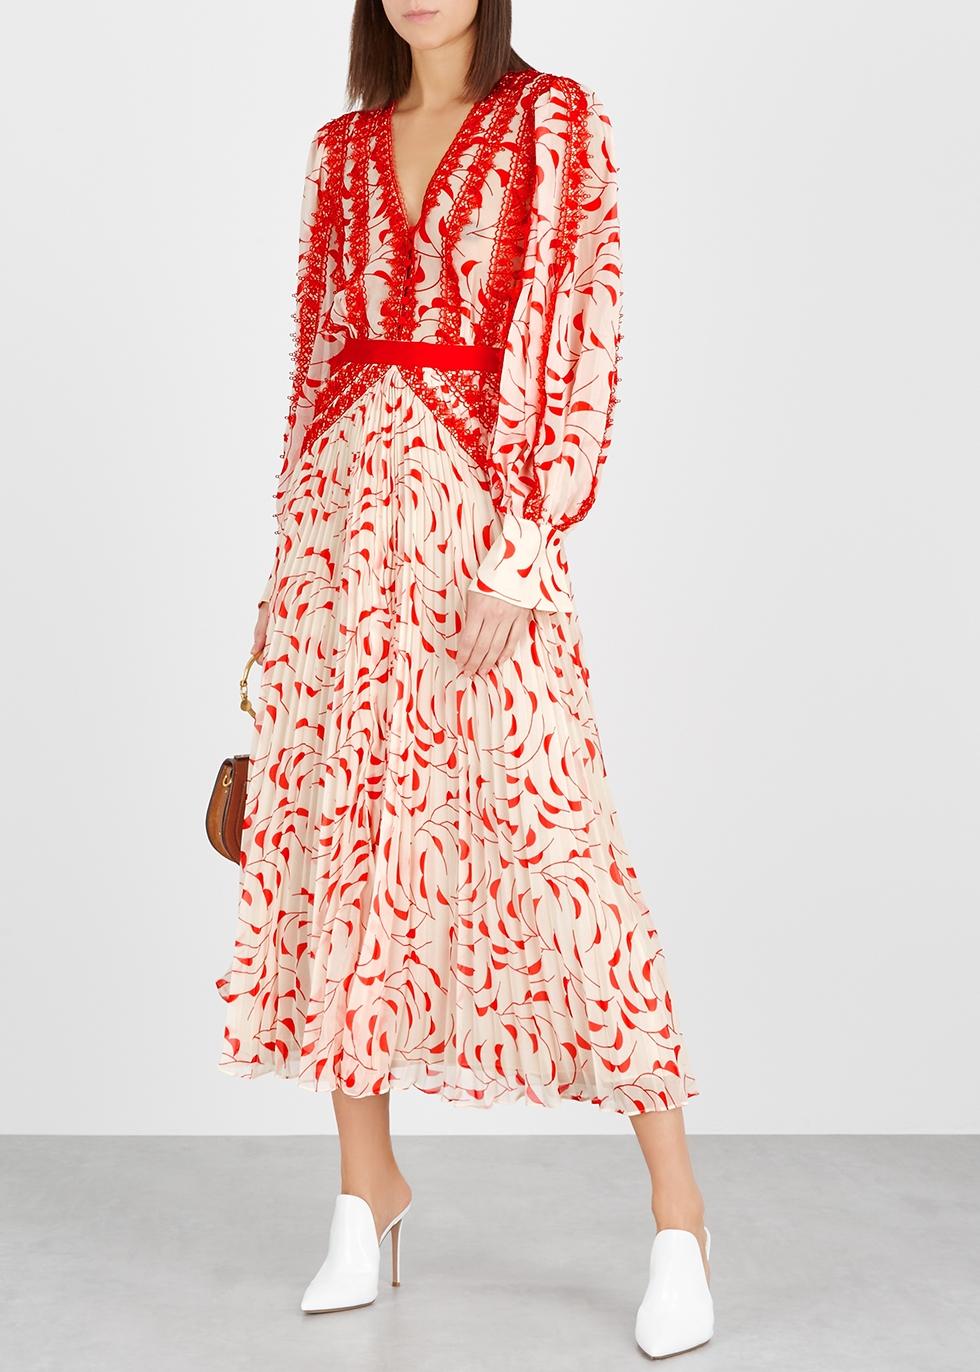 5f5c8c1985a7 SELF-PORTRAIT Crescent-print chiffon midi dress - Harvey Nichols